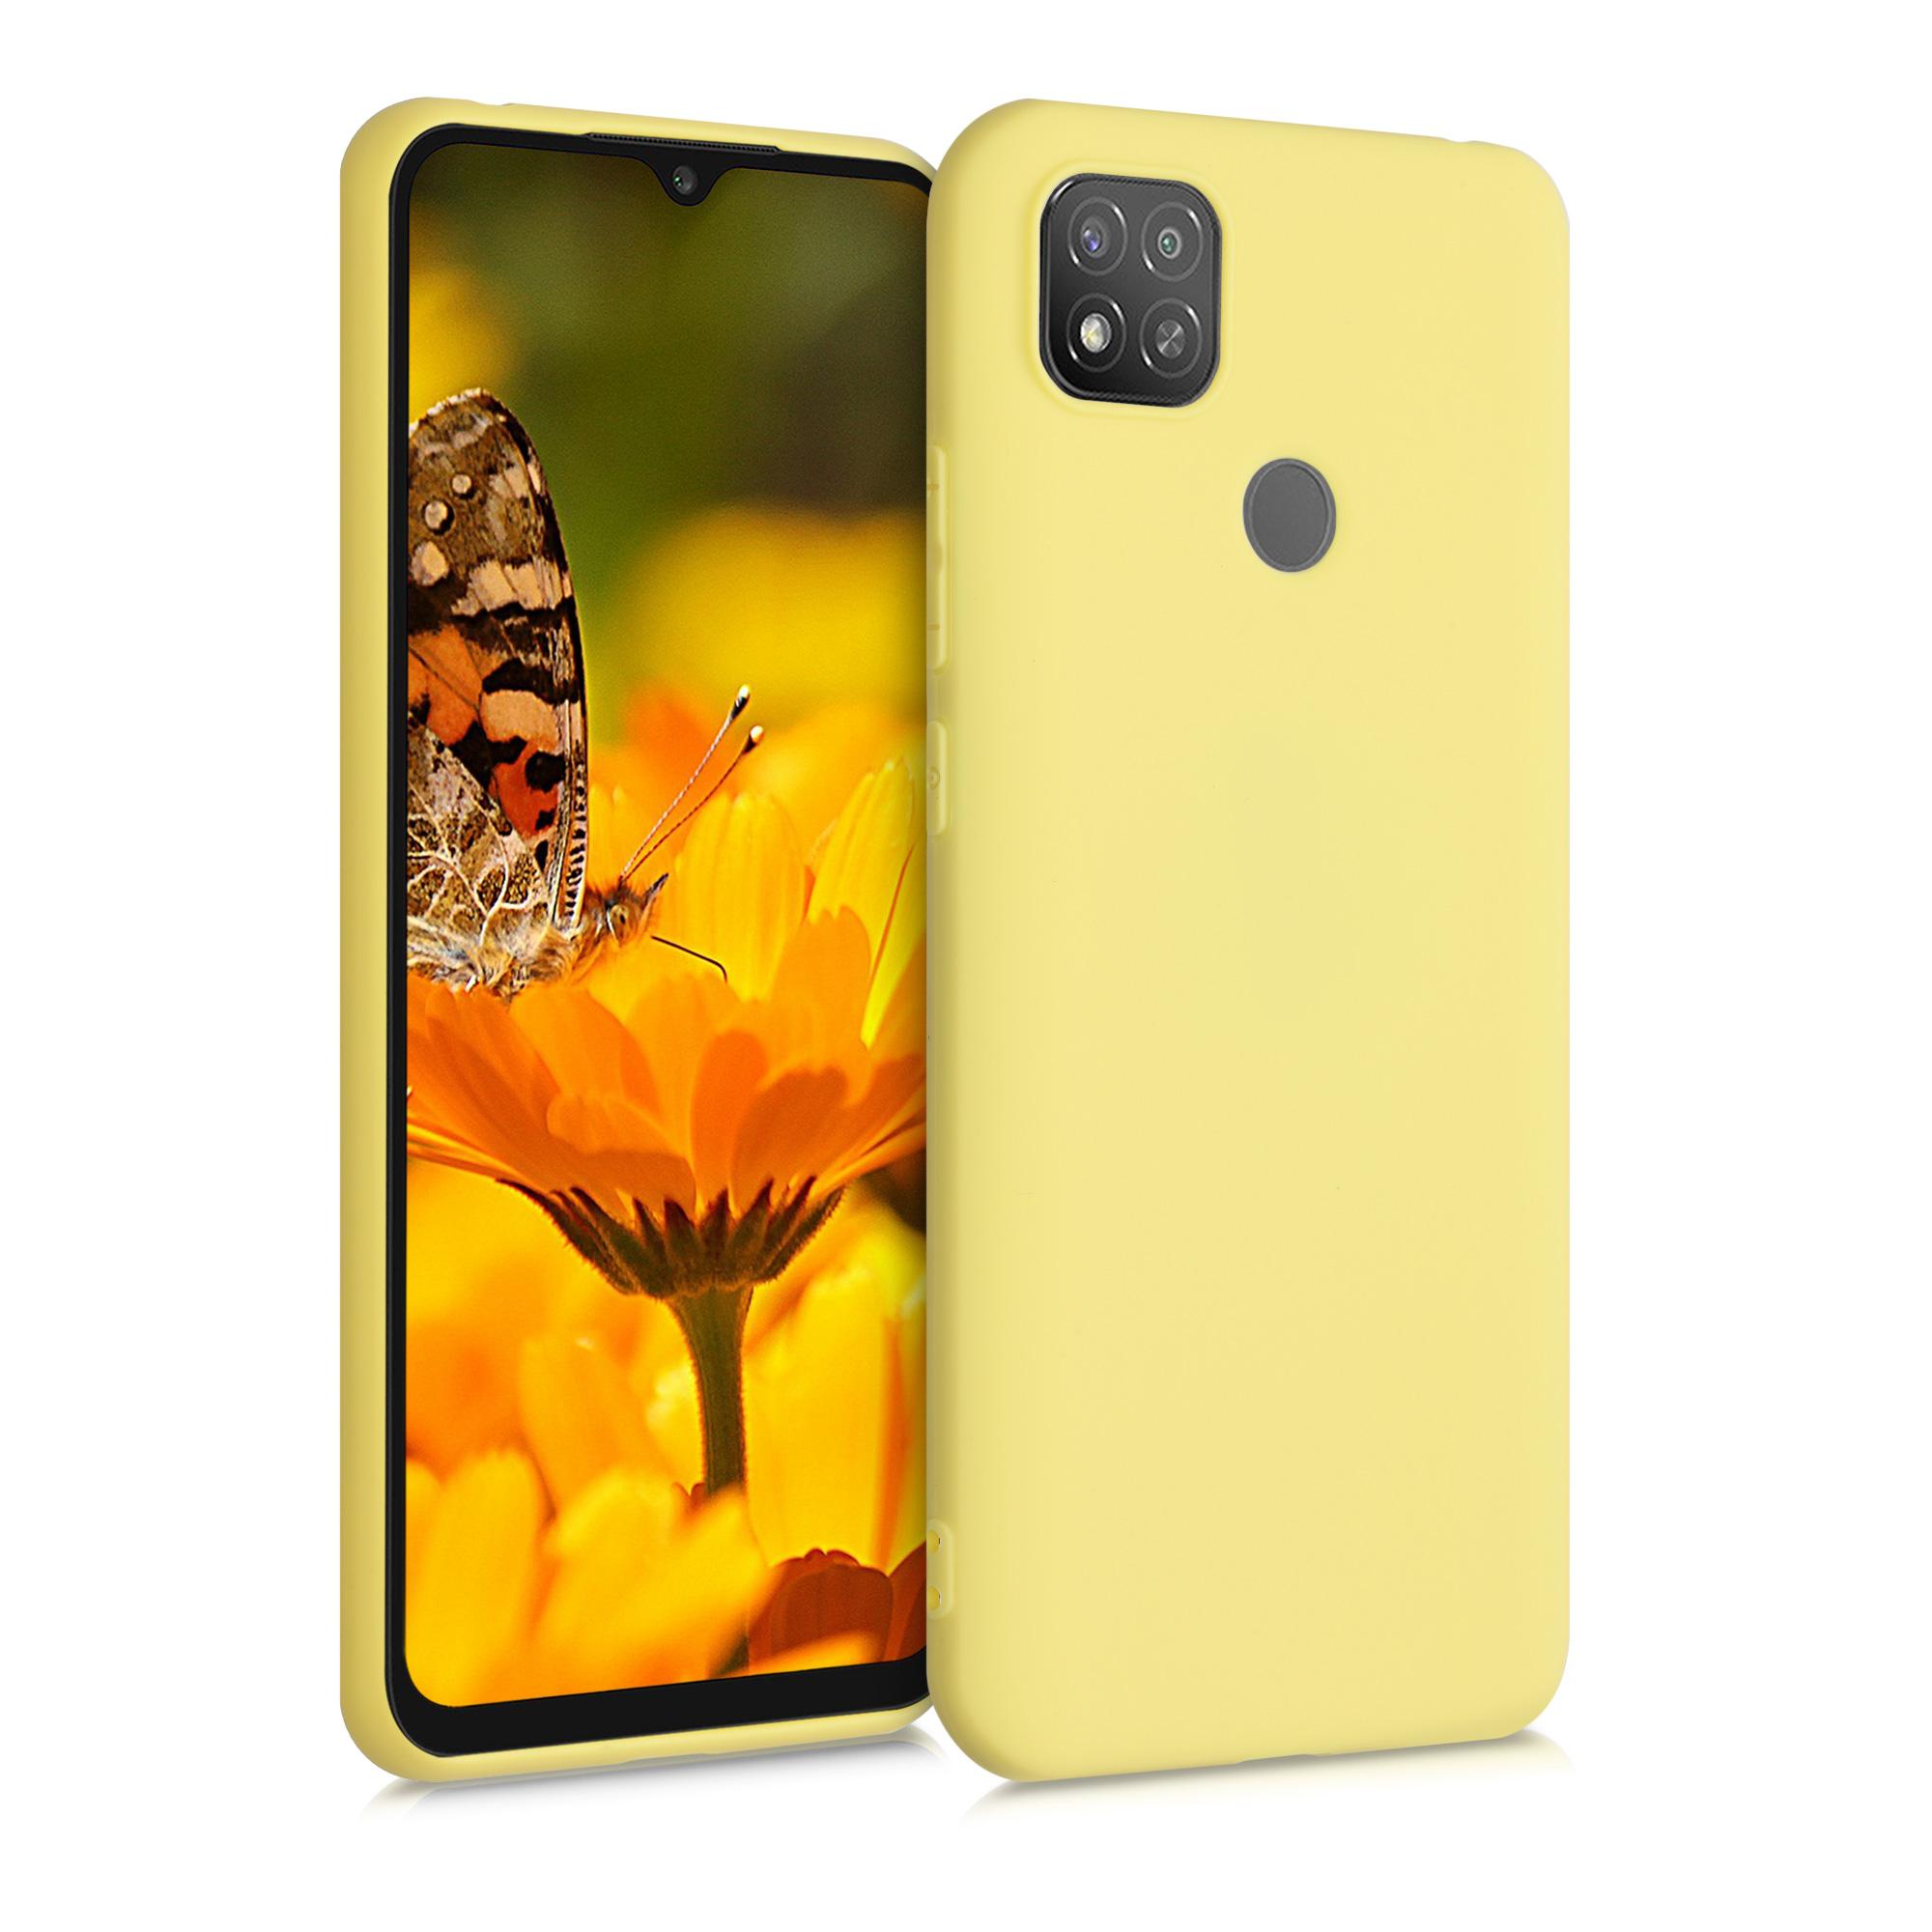 Kvalitní silikonové TPU pouzdro | obal pro Xiaomi Redmi 9C - žluté matný